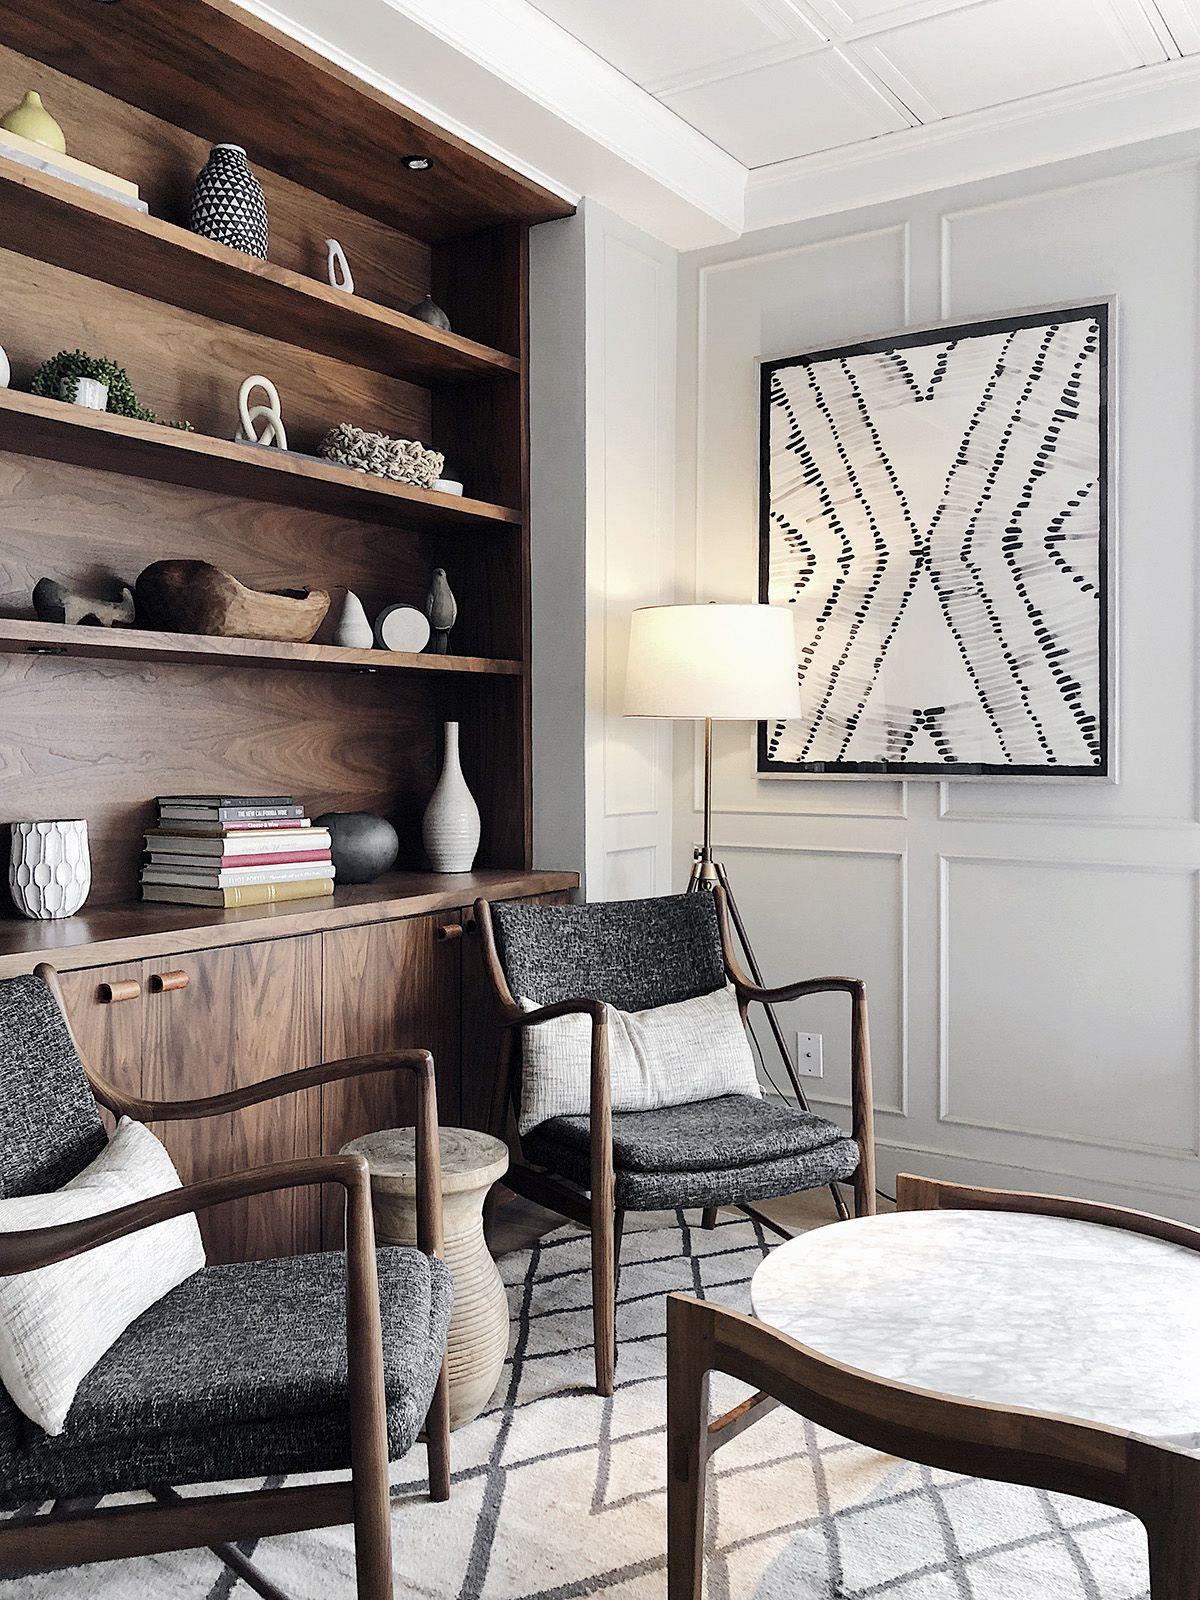 Rustic Scandinavian Design Inspiration From A Boutique Hotel Home Decor Bedroom Interior Design Rustic Scandinavian Bedroom Decor